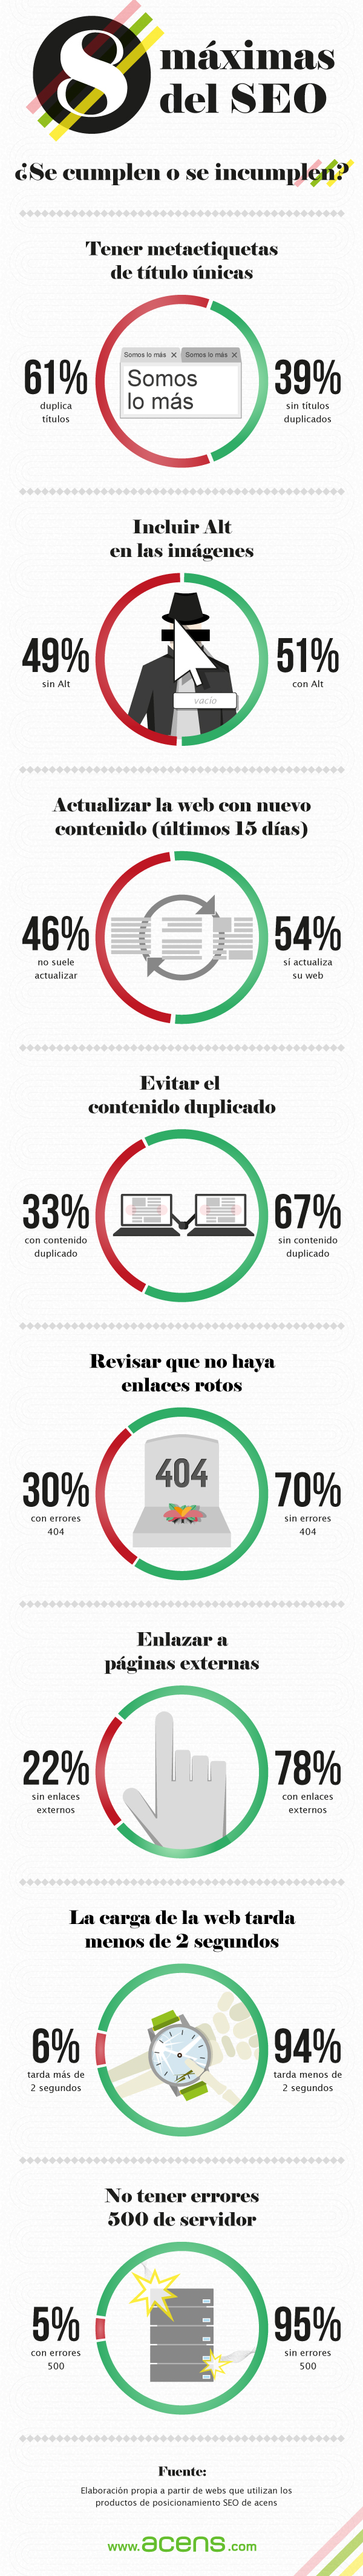 Infografía 8 máximas del SEO